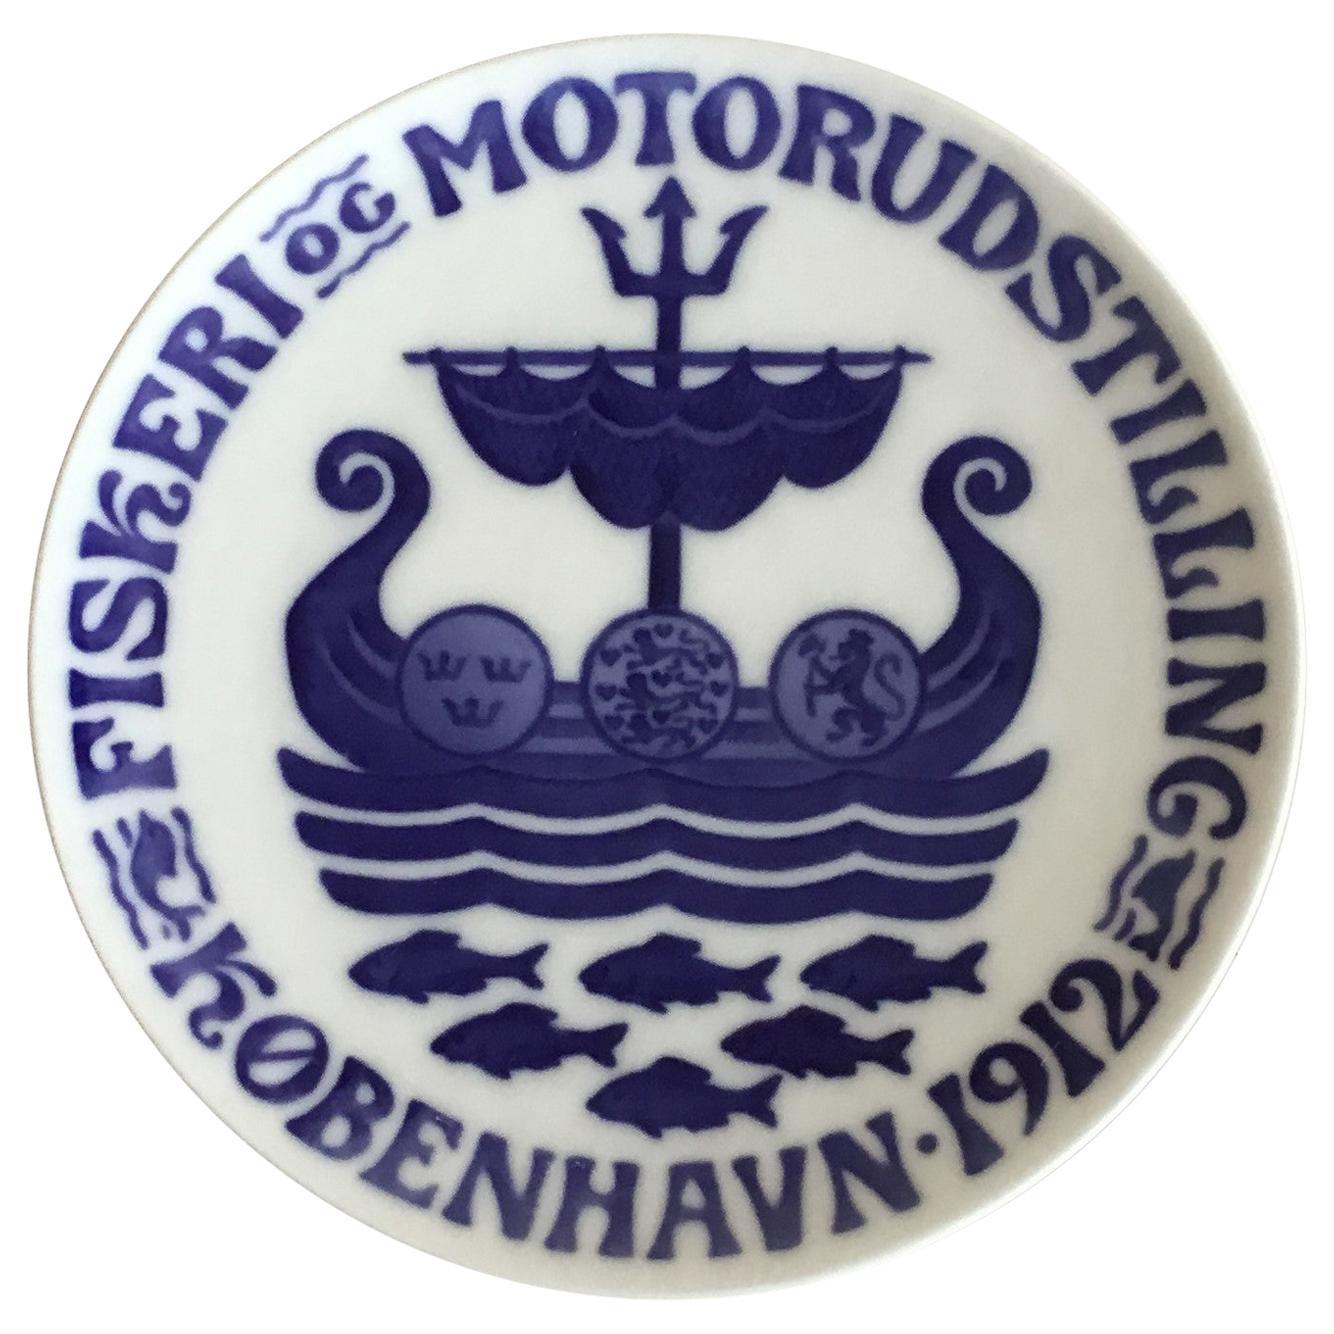 Royal Copenhagen Commemorative Plate from 1912 RC-CM134